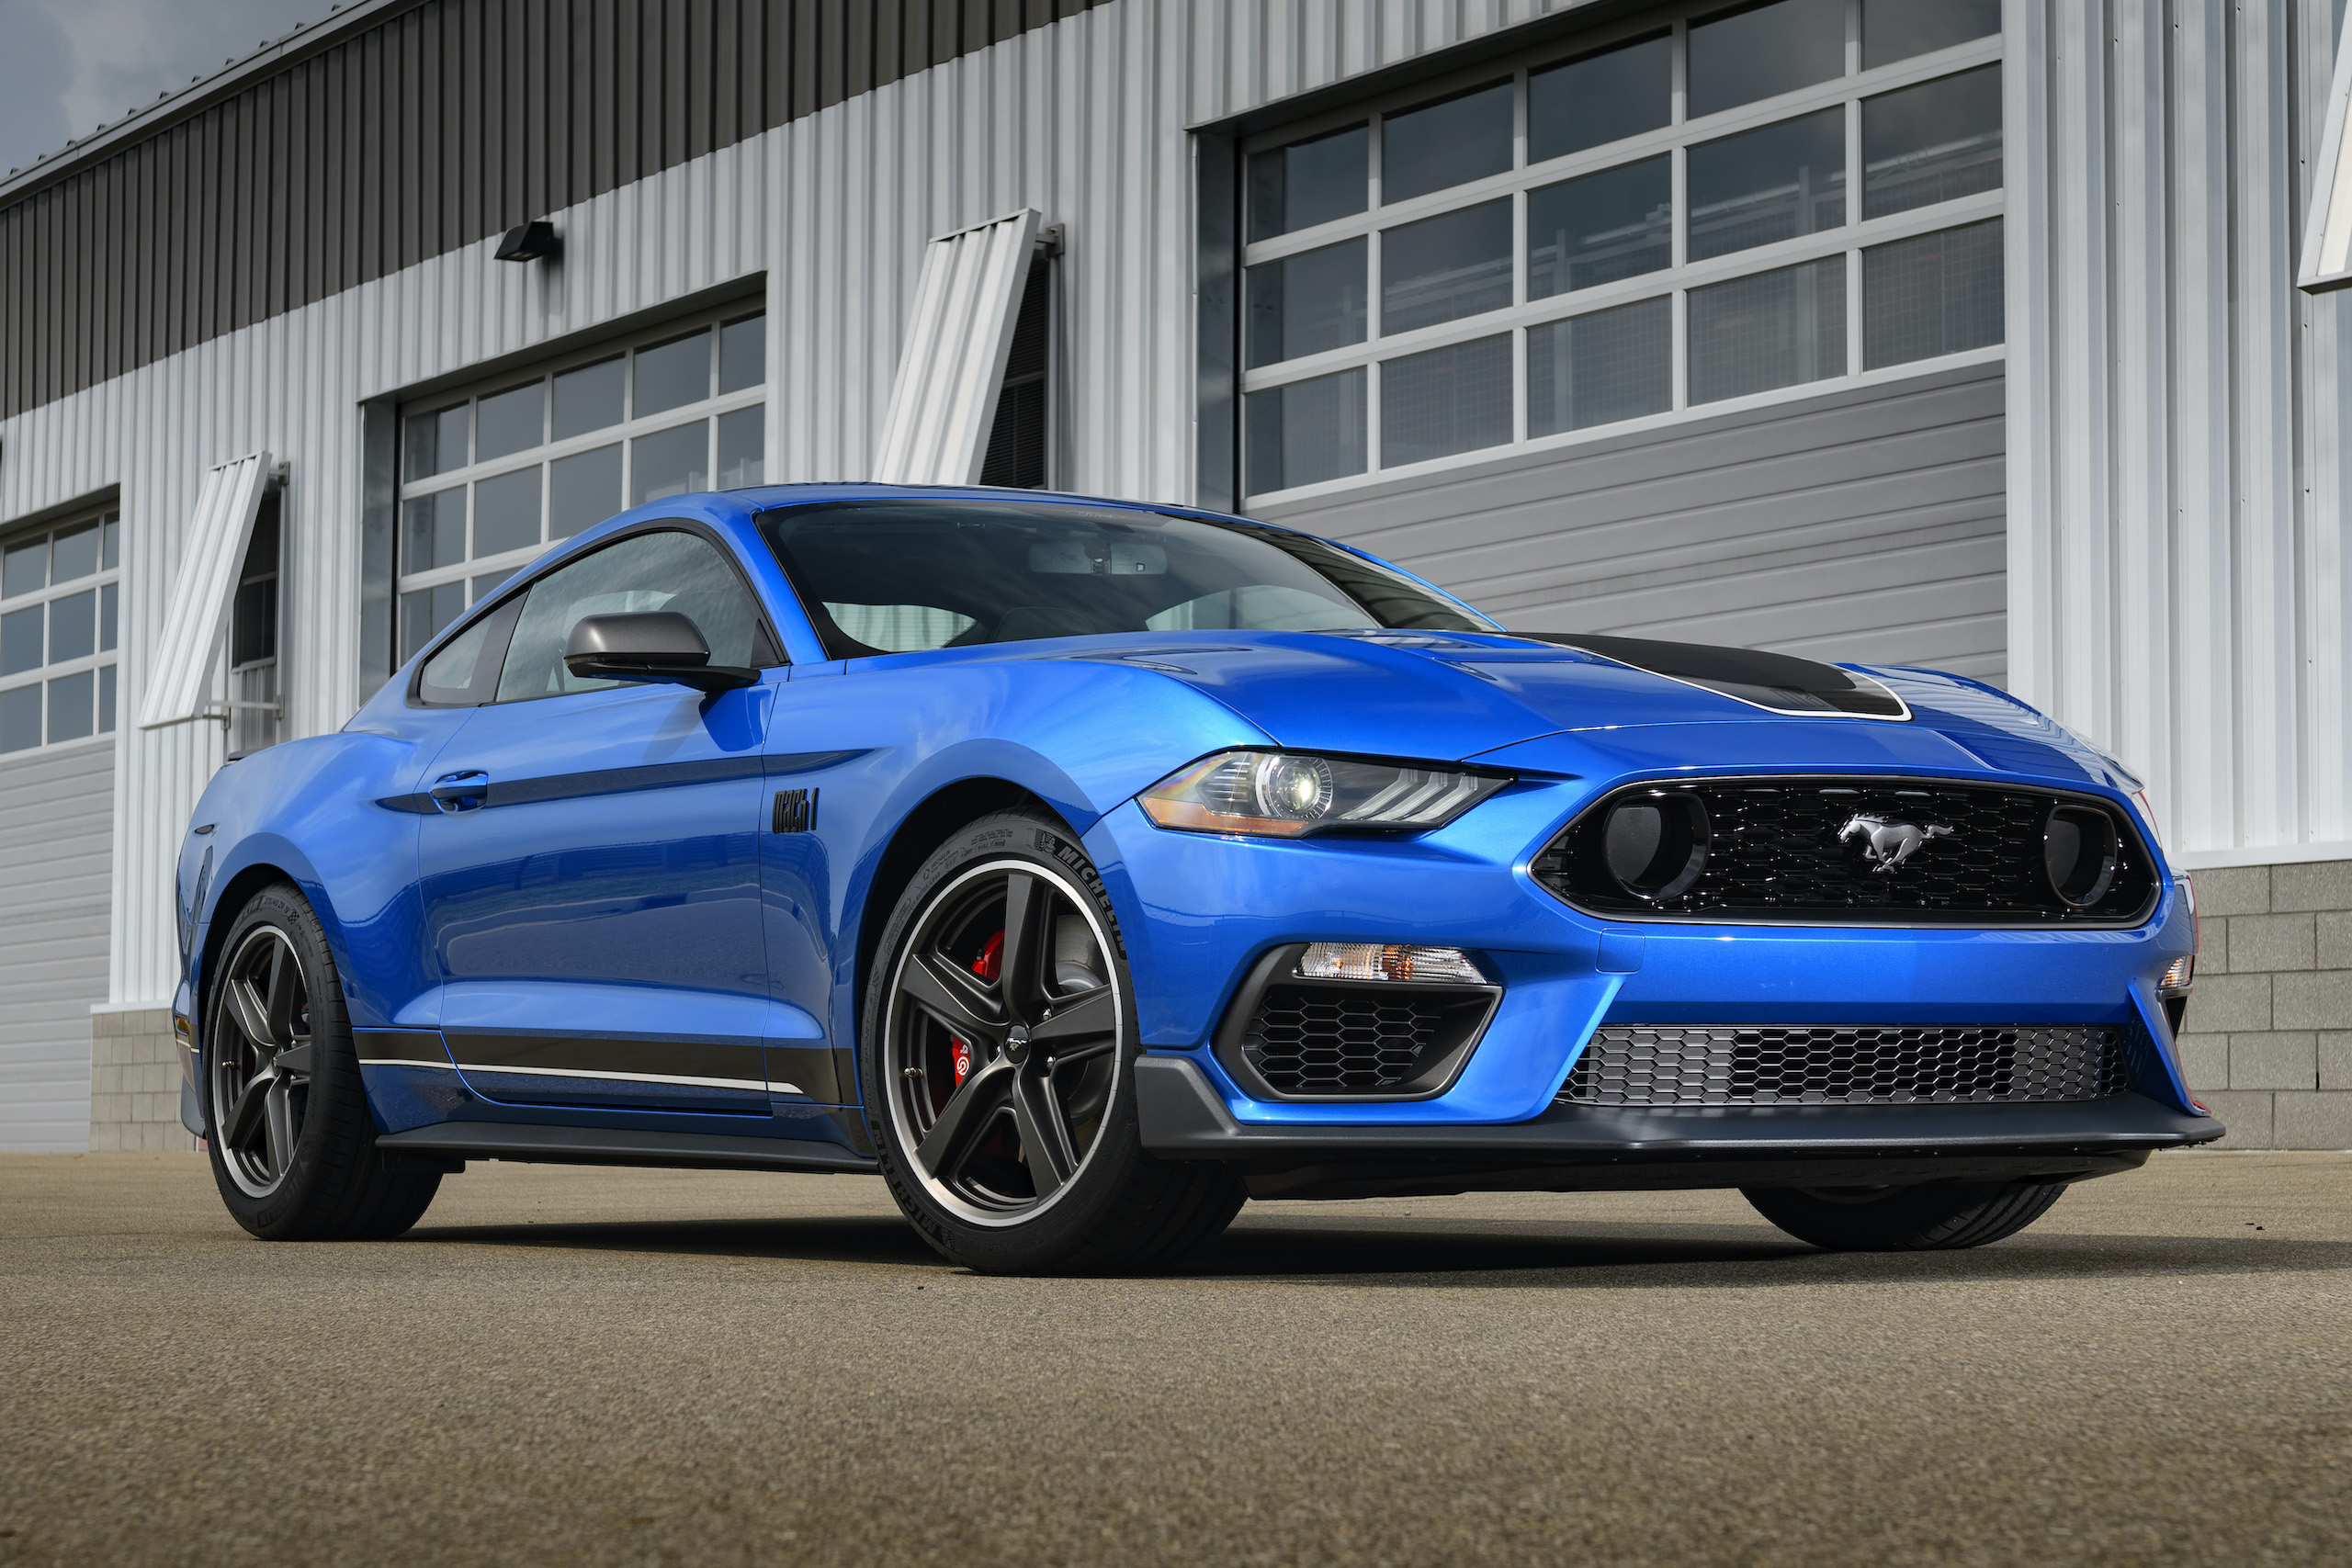 2021 Mustang Mach 1 blue front three-quarter